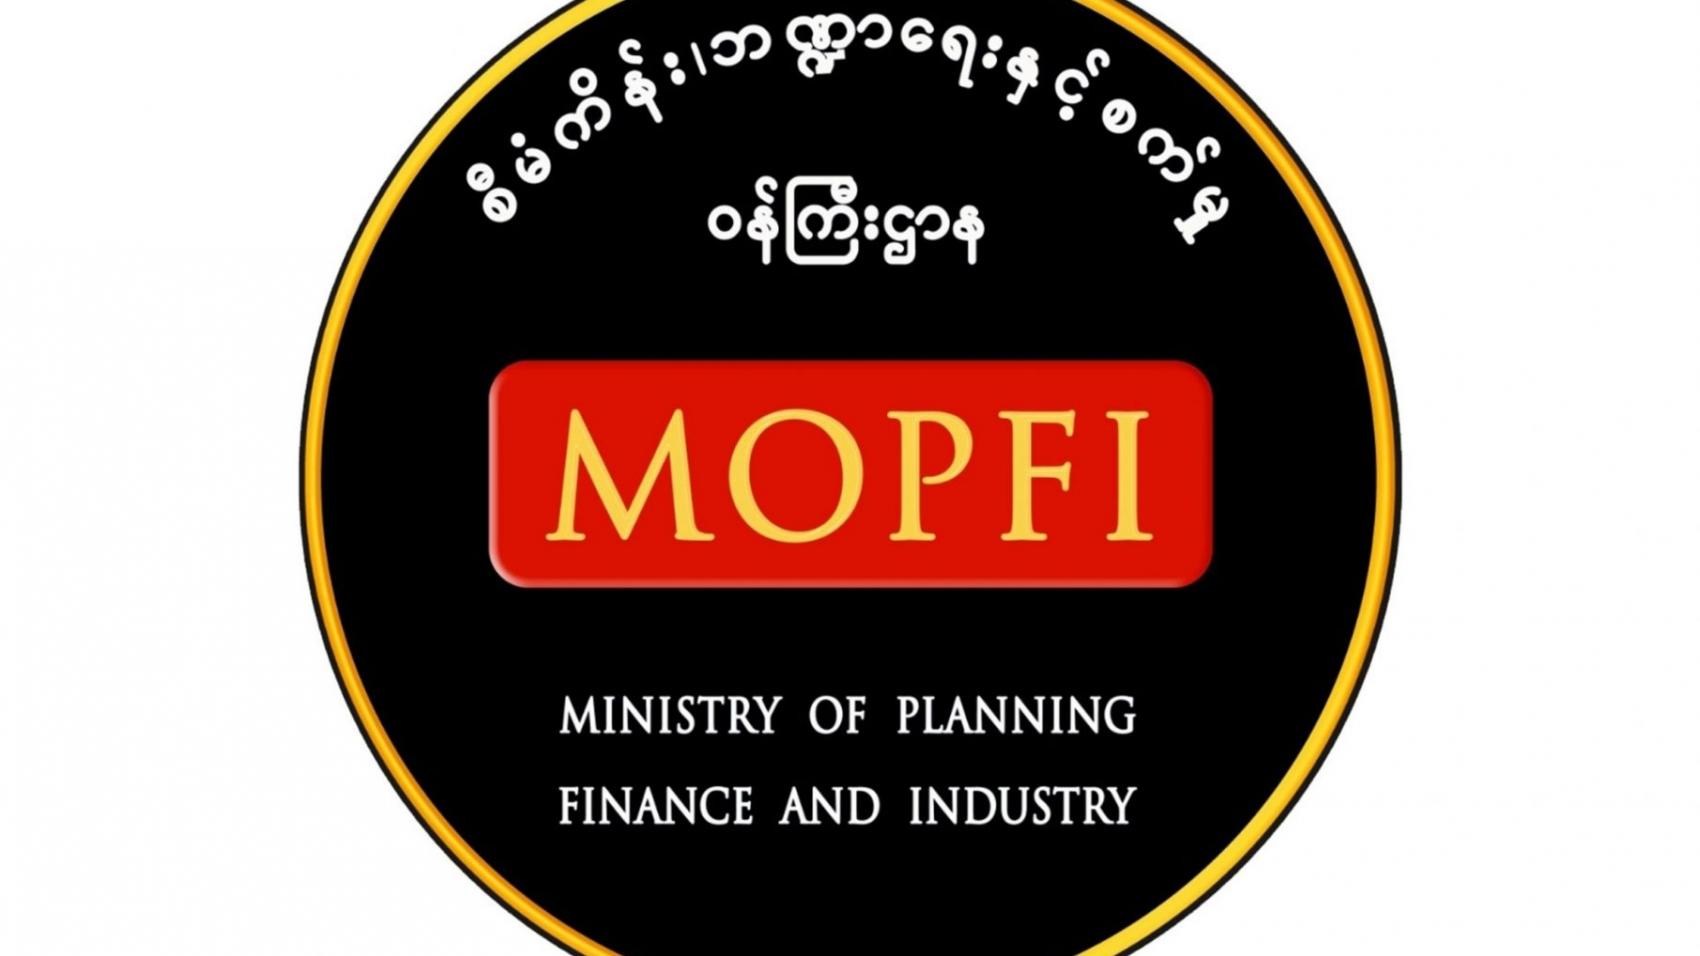 MOPFI-small-scaled